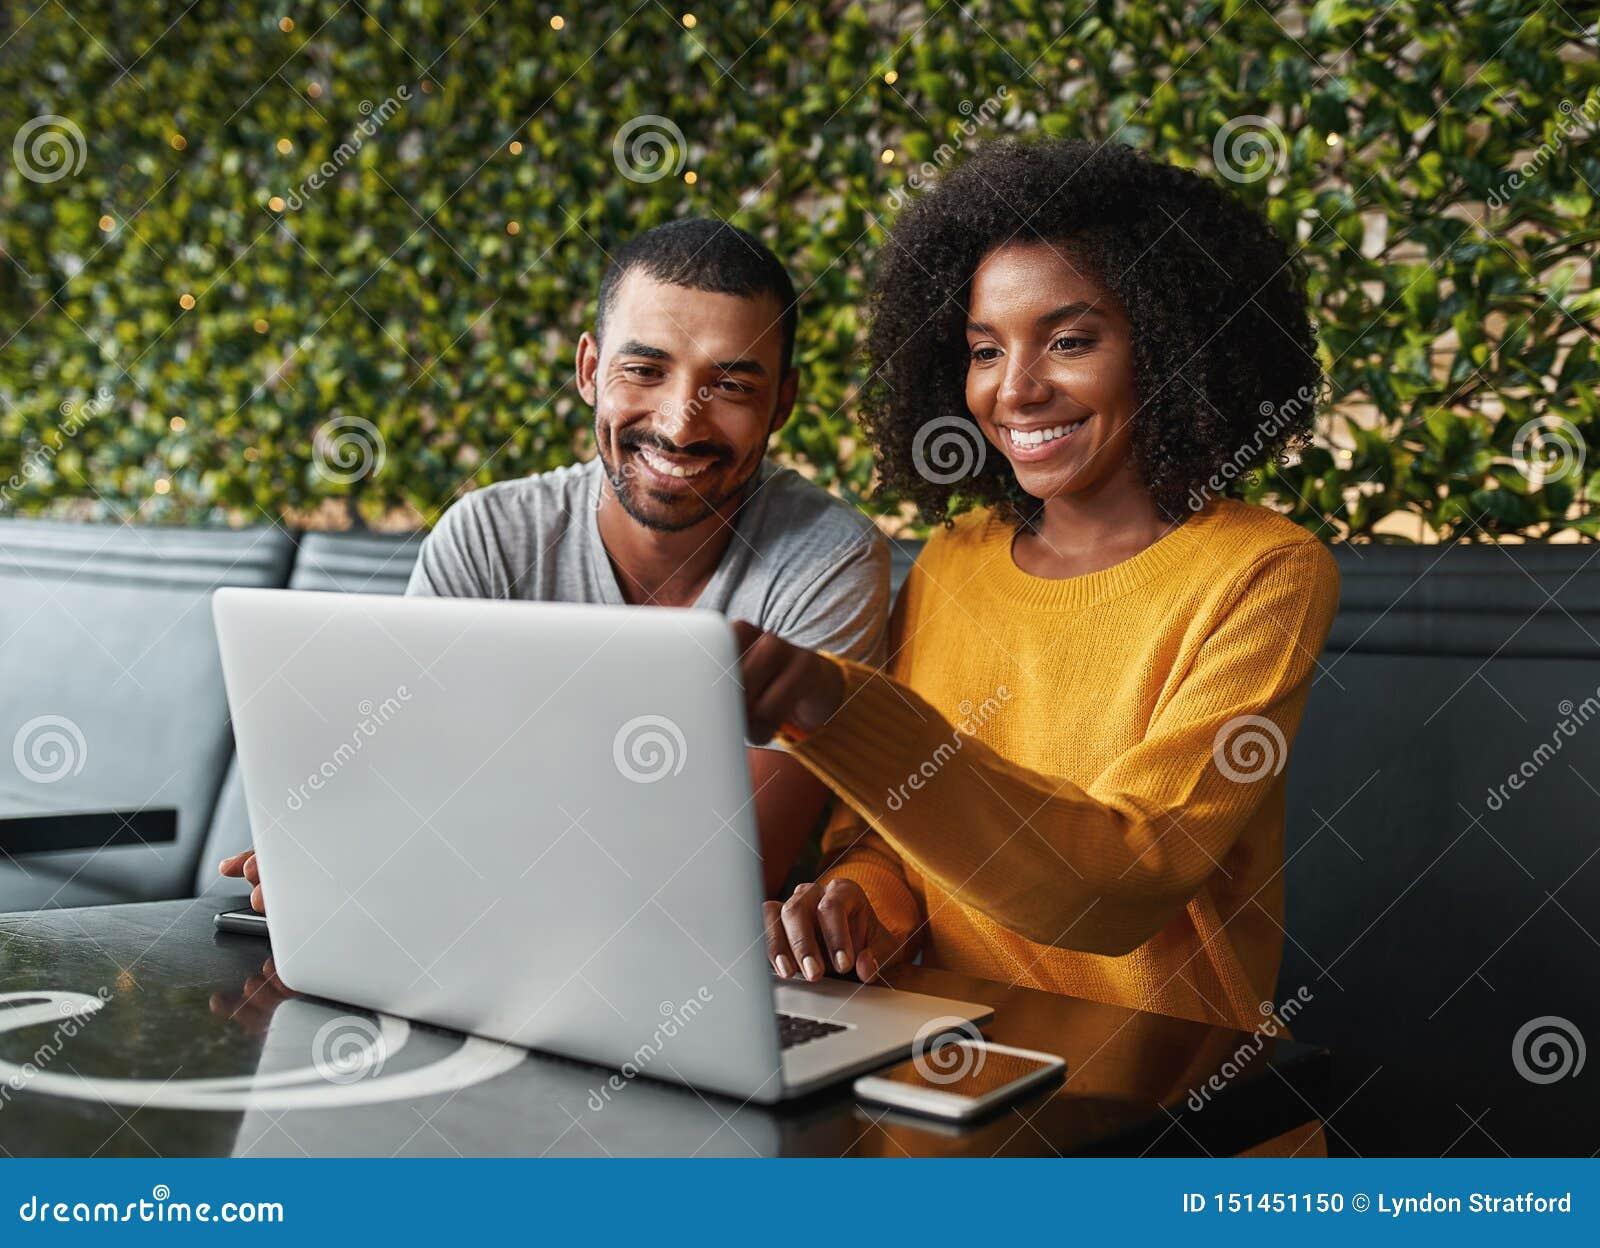 Junge Paare im café, das Laptop betrachtet